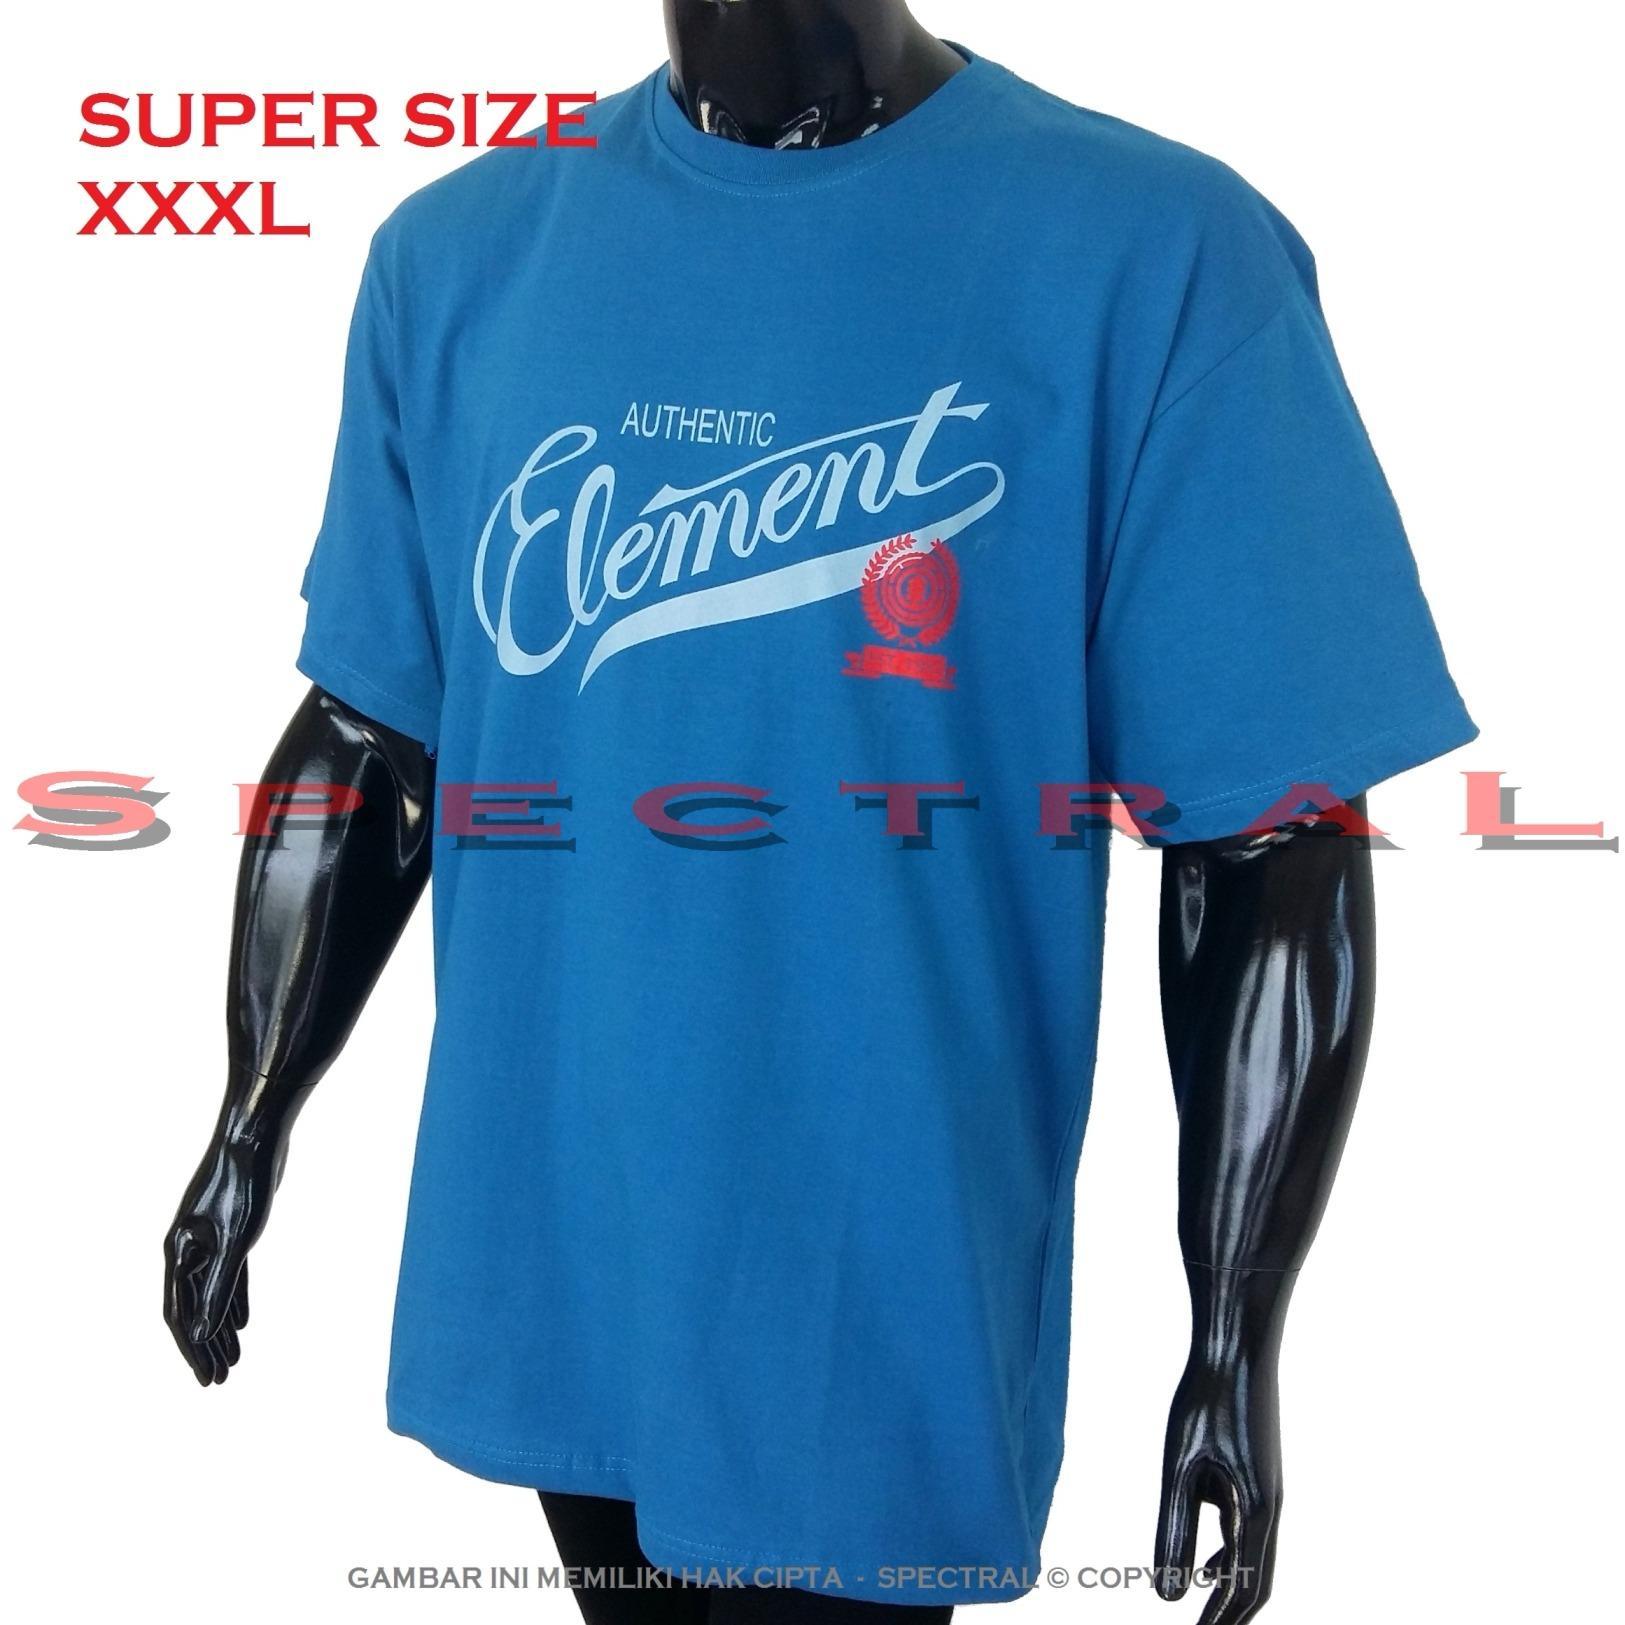 Spectral – 3XL SUPER BIG SIZE XXXL 100% Cotton Combed Kaos Distro Jumbo BIGSIZE T-Shirt Fashion Ukuran Besar Polos Celana Atasan Pria Wanita Katun Bapak Orang Tua Gemuk Gendut Simple Sport Casual Halus Baju Cowo Cewe Pakaian Super Size 3L ELEMENT BIRU